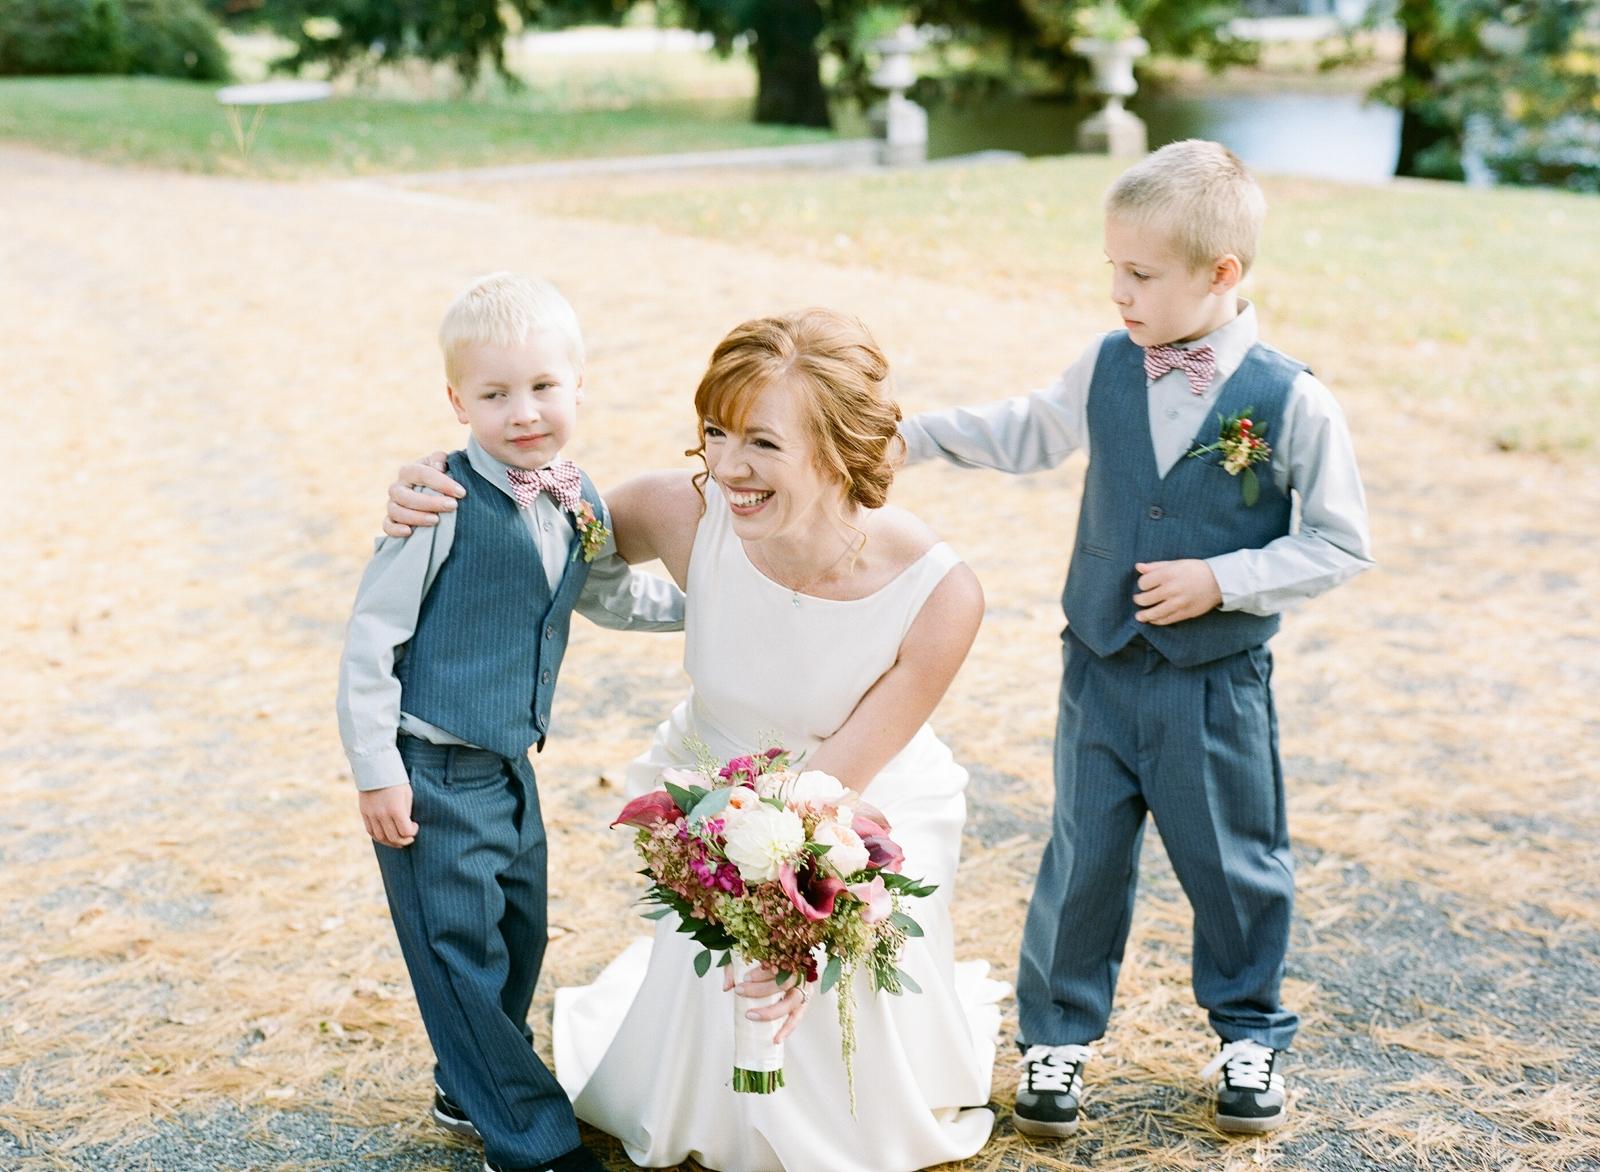 ringwood new jersey wedding photographer shannon griffin_0025.jpg